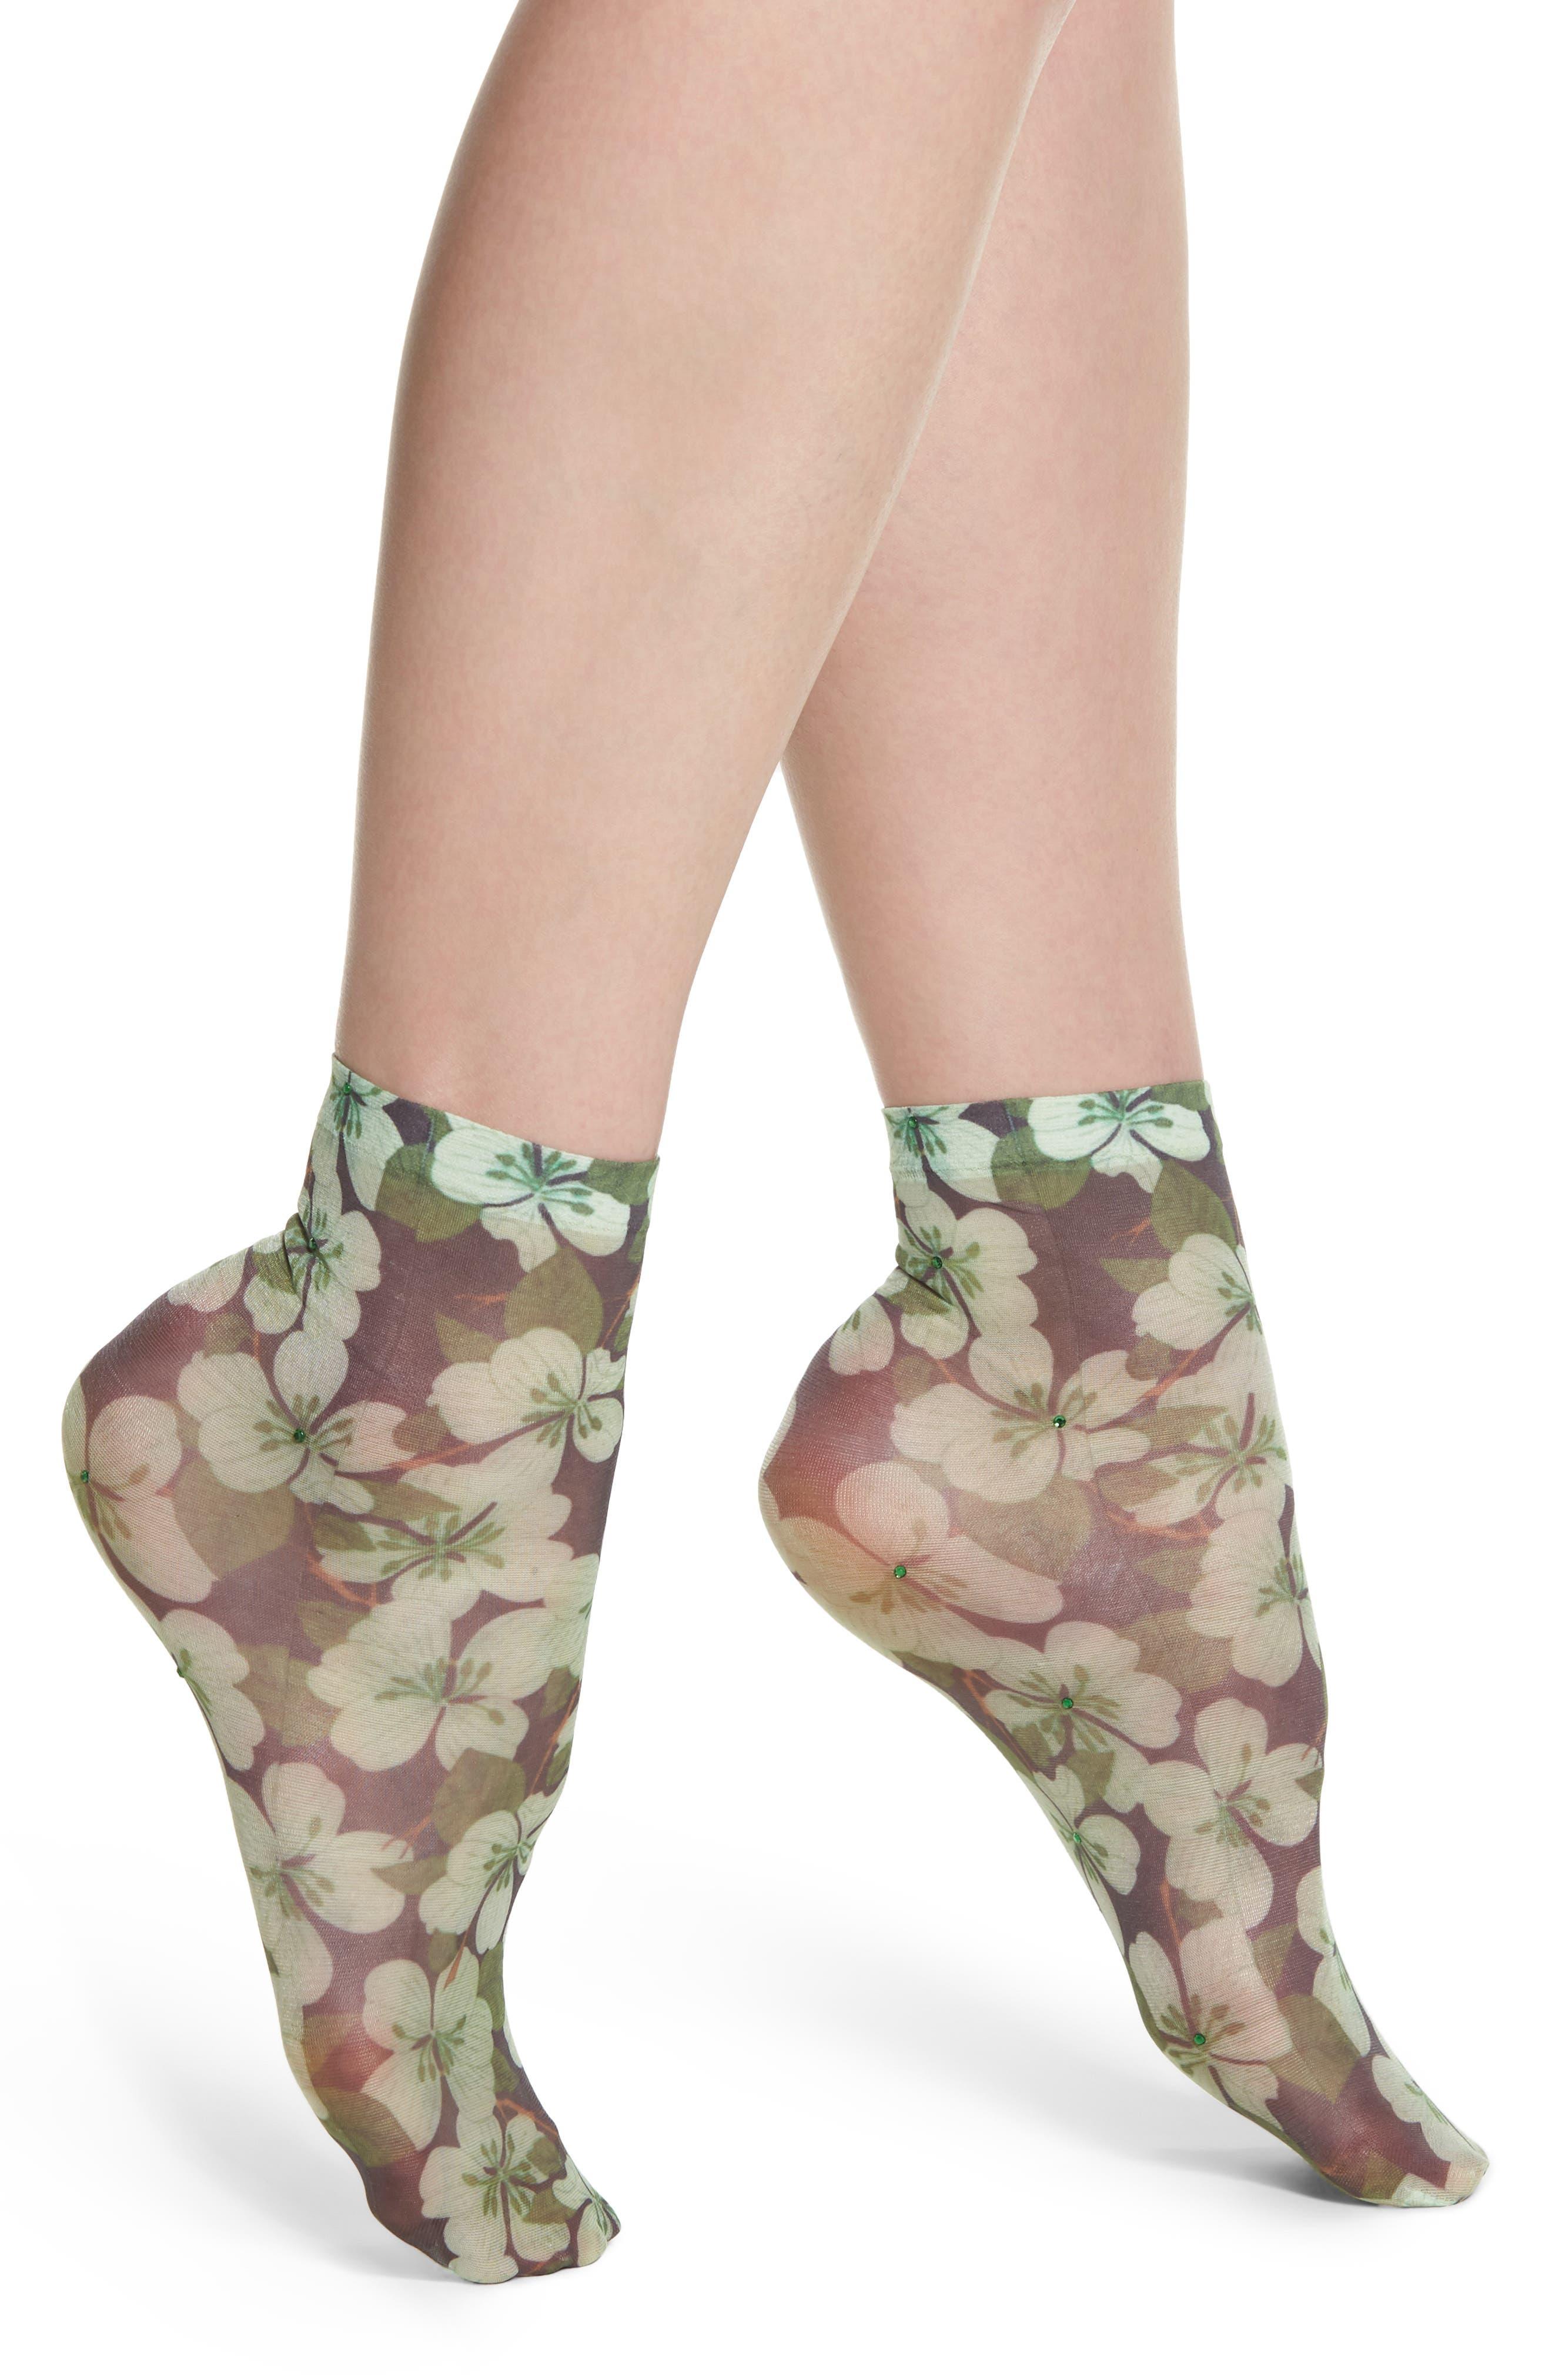 Annavittoria Ankle Socks,                         Main,                         color, 440